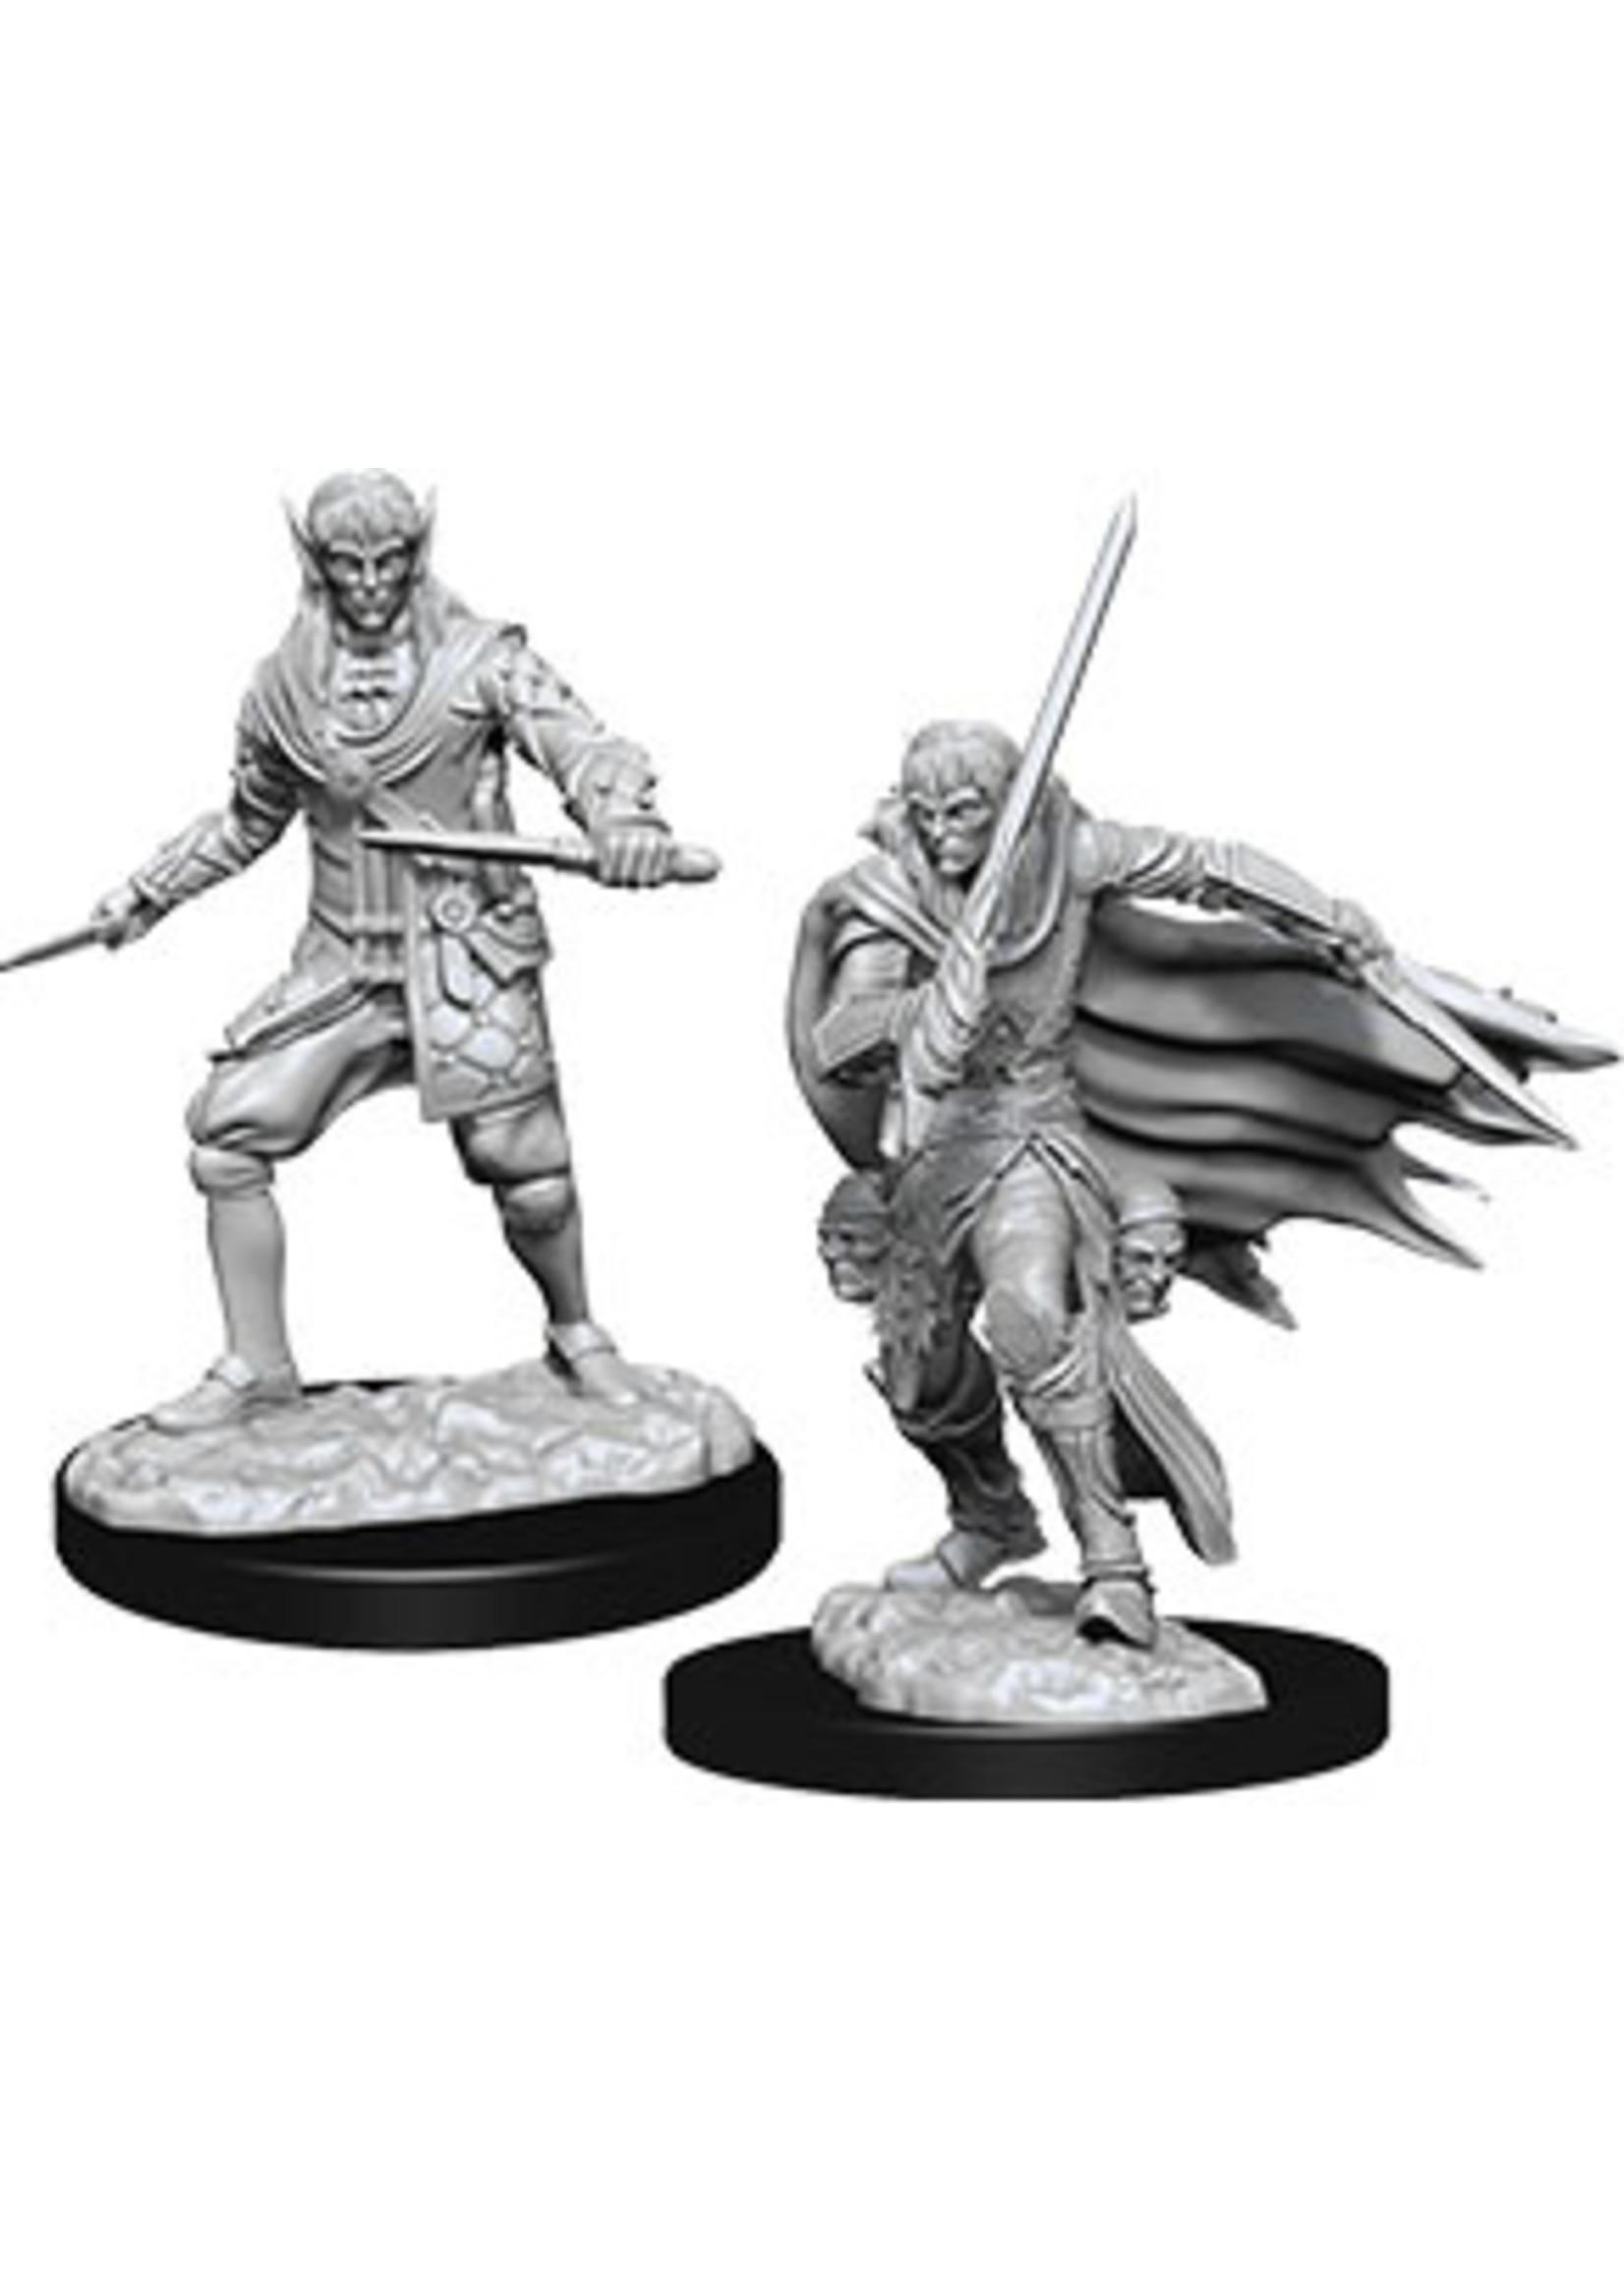 Pathfinder Deep Cuts Unpainted Miniatures: W10 Male Elf Rogue